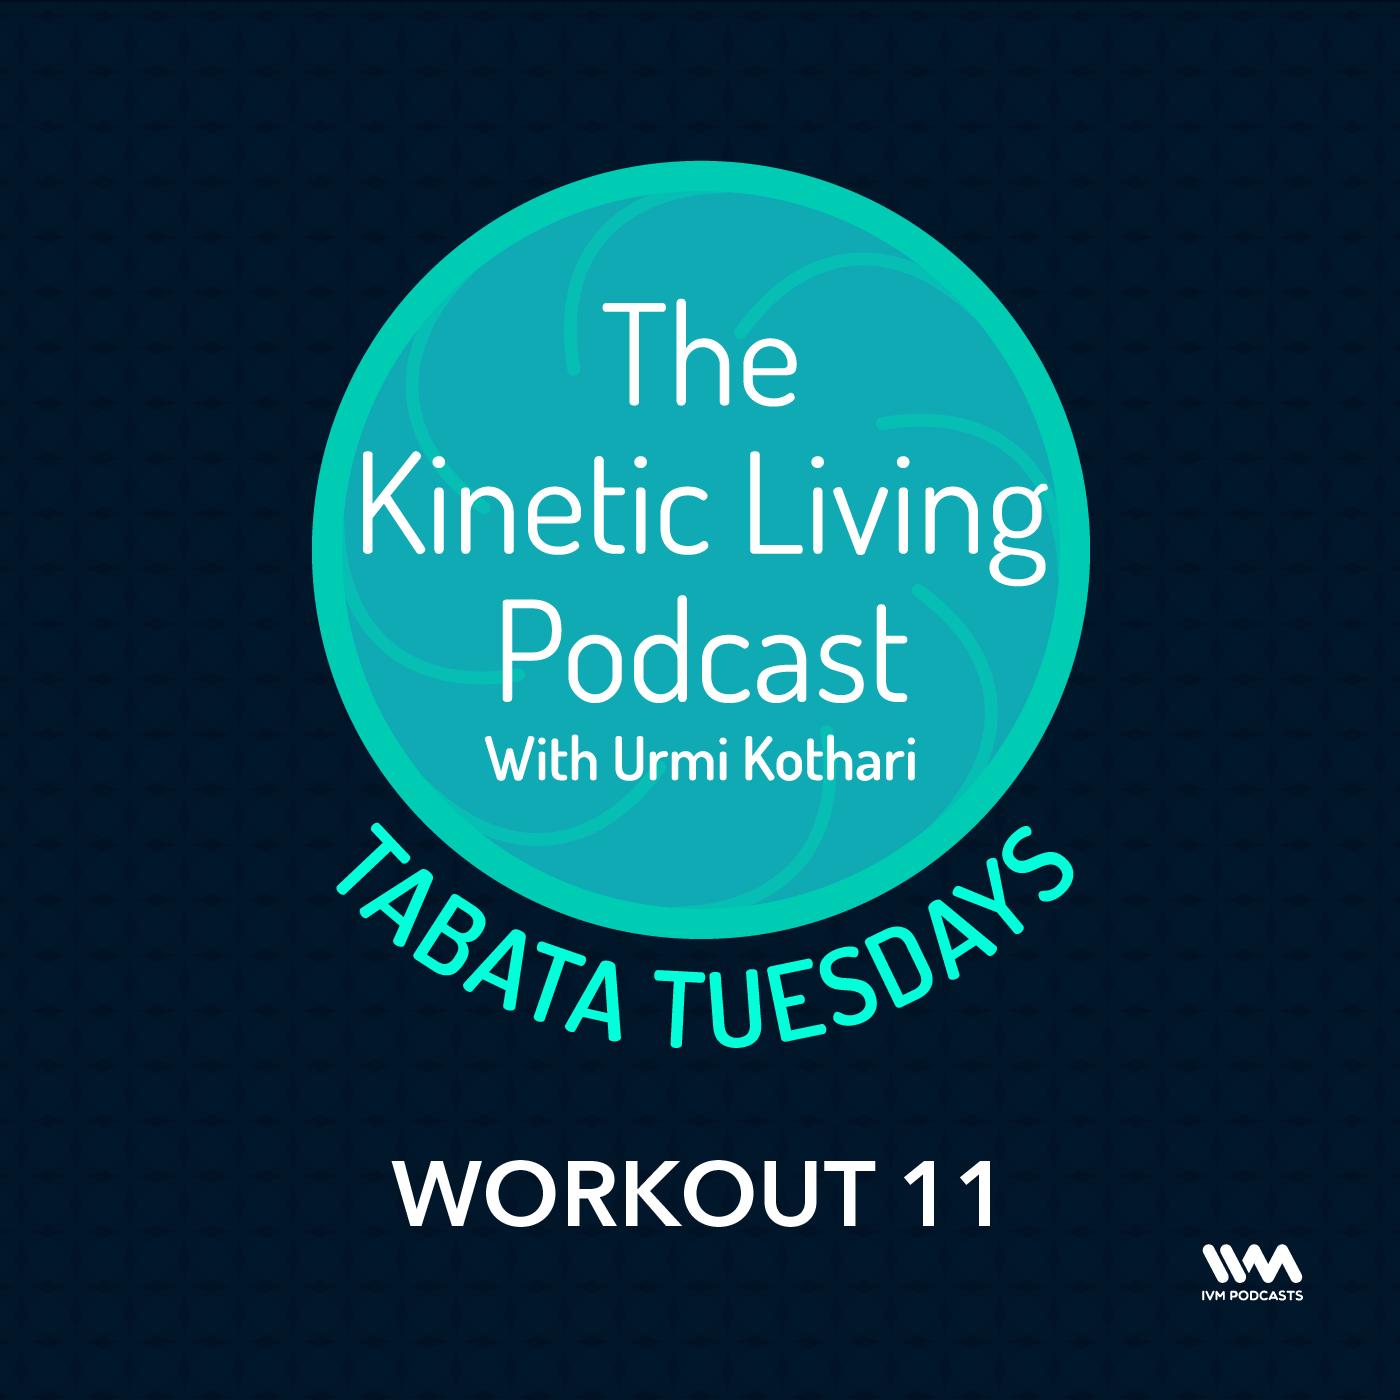 S02 E11: Tabata Tuesday: Workout 11